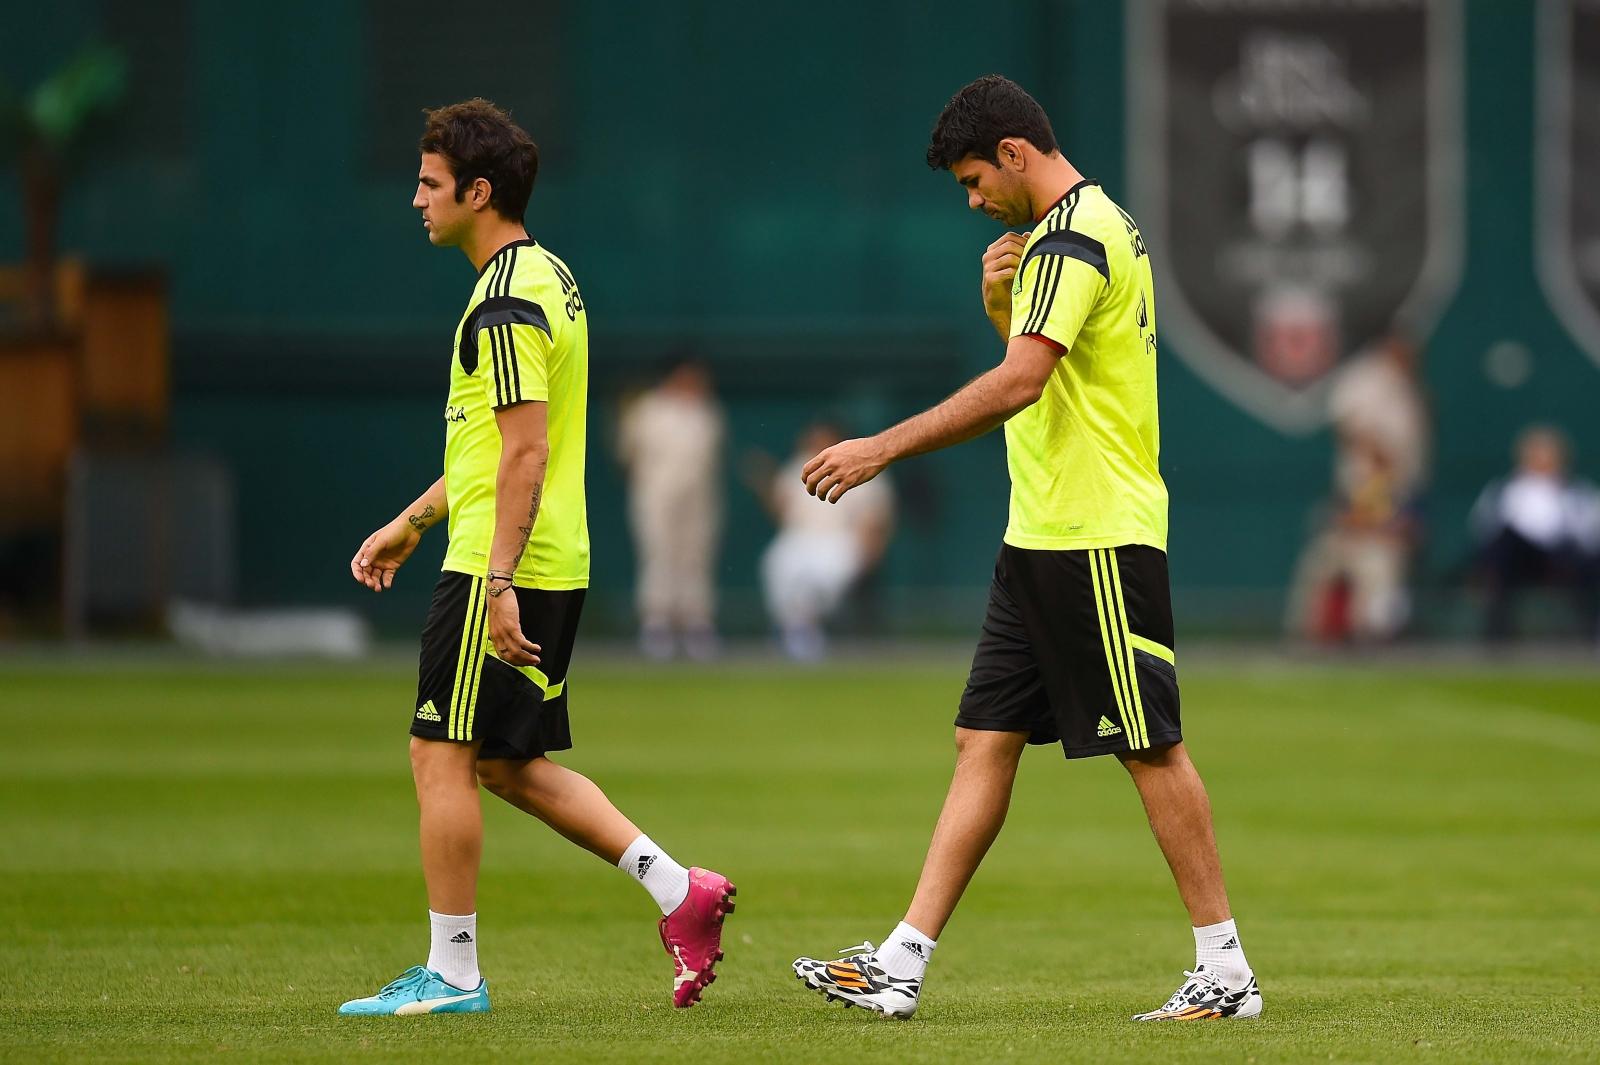 Fabregas and Costa